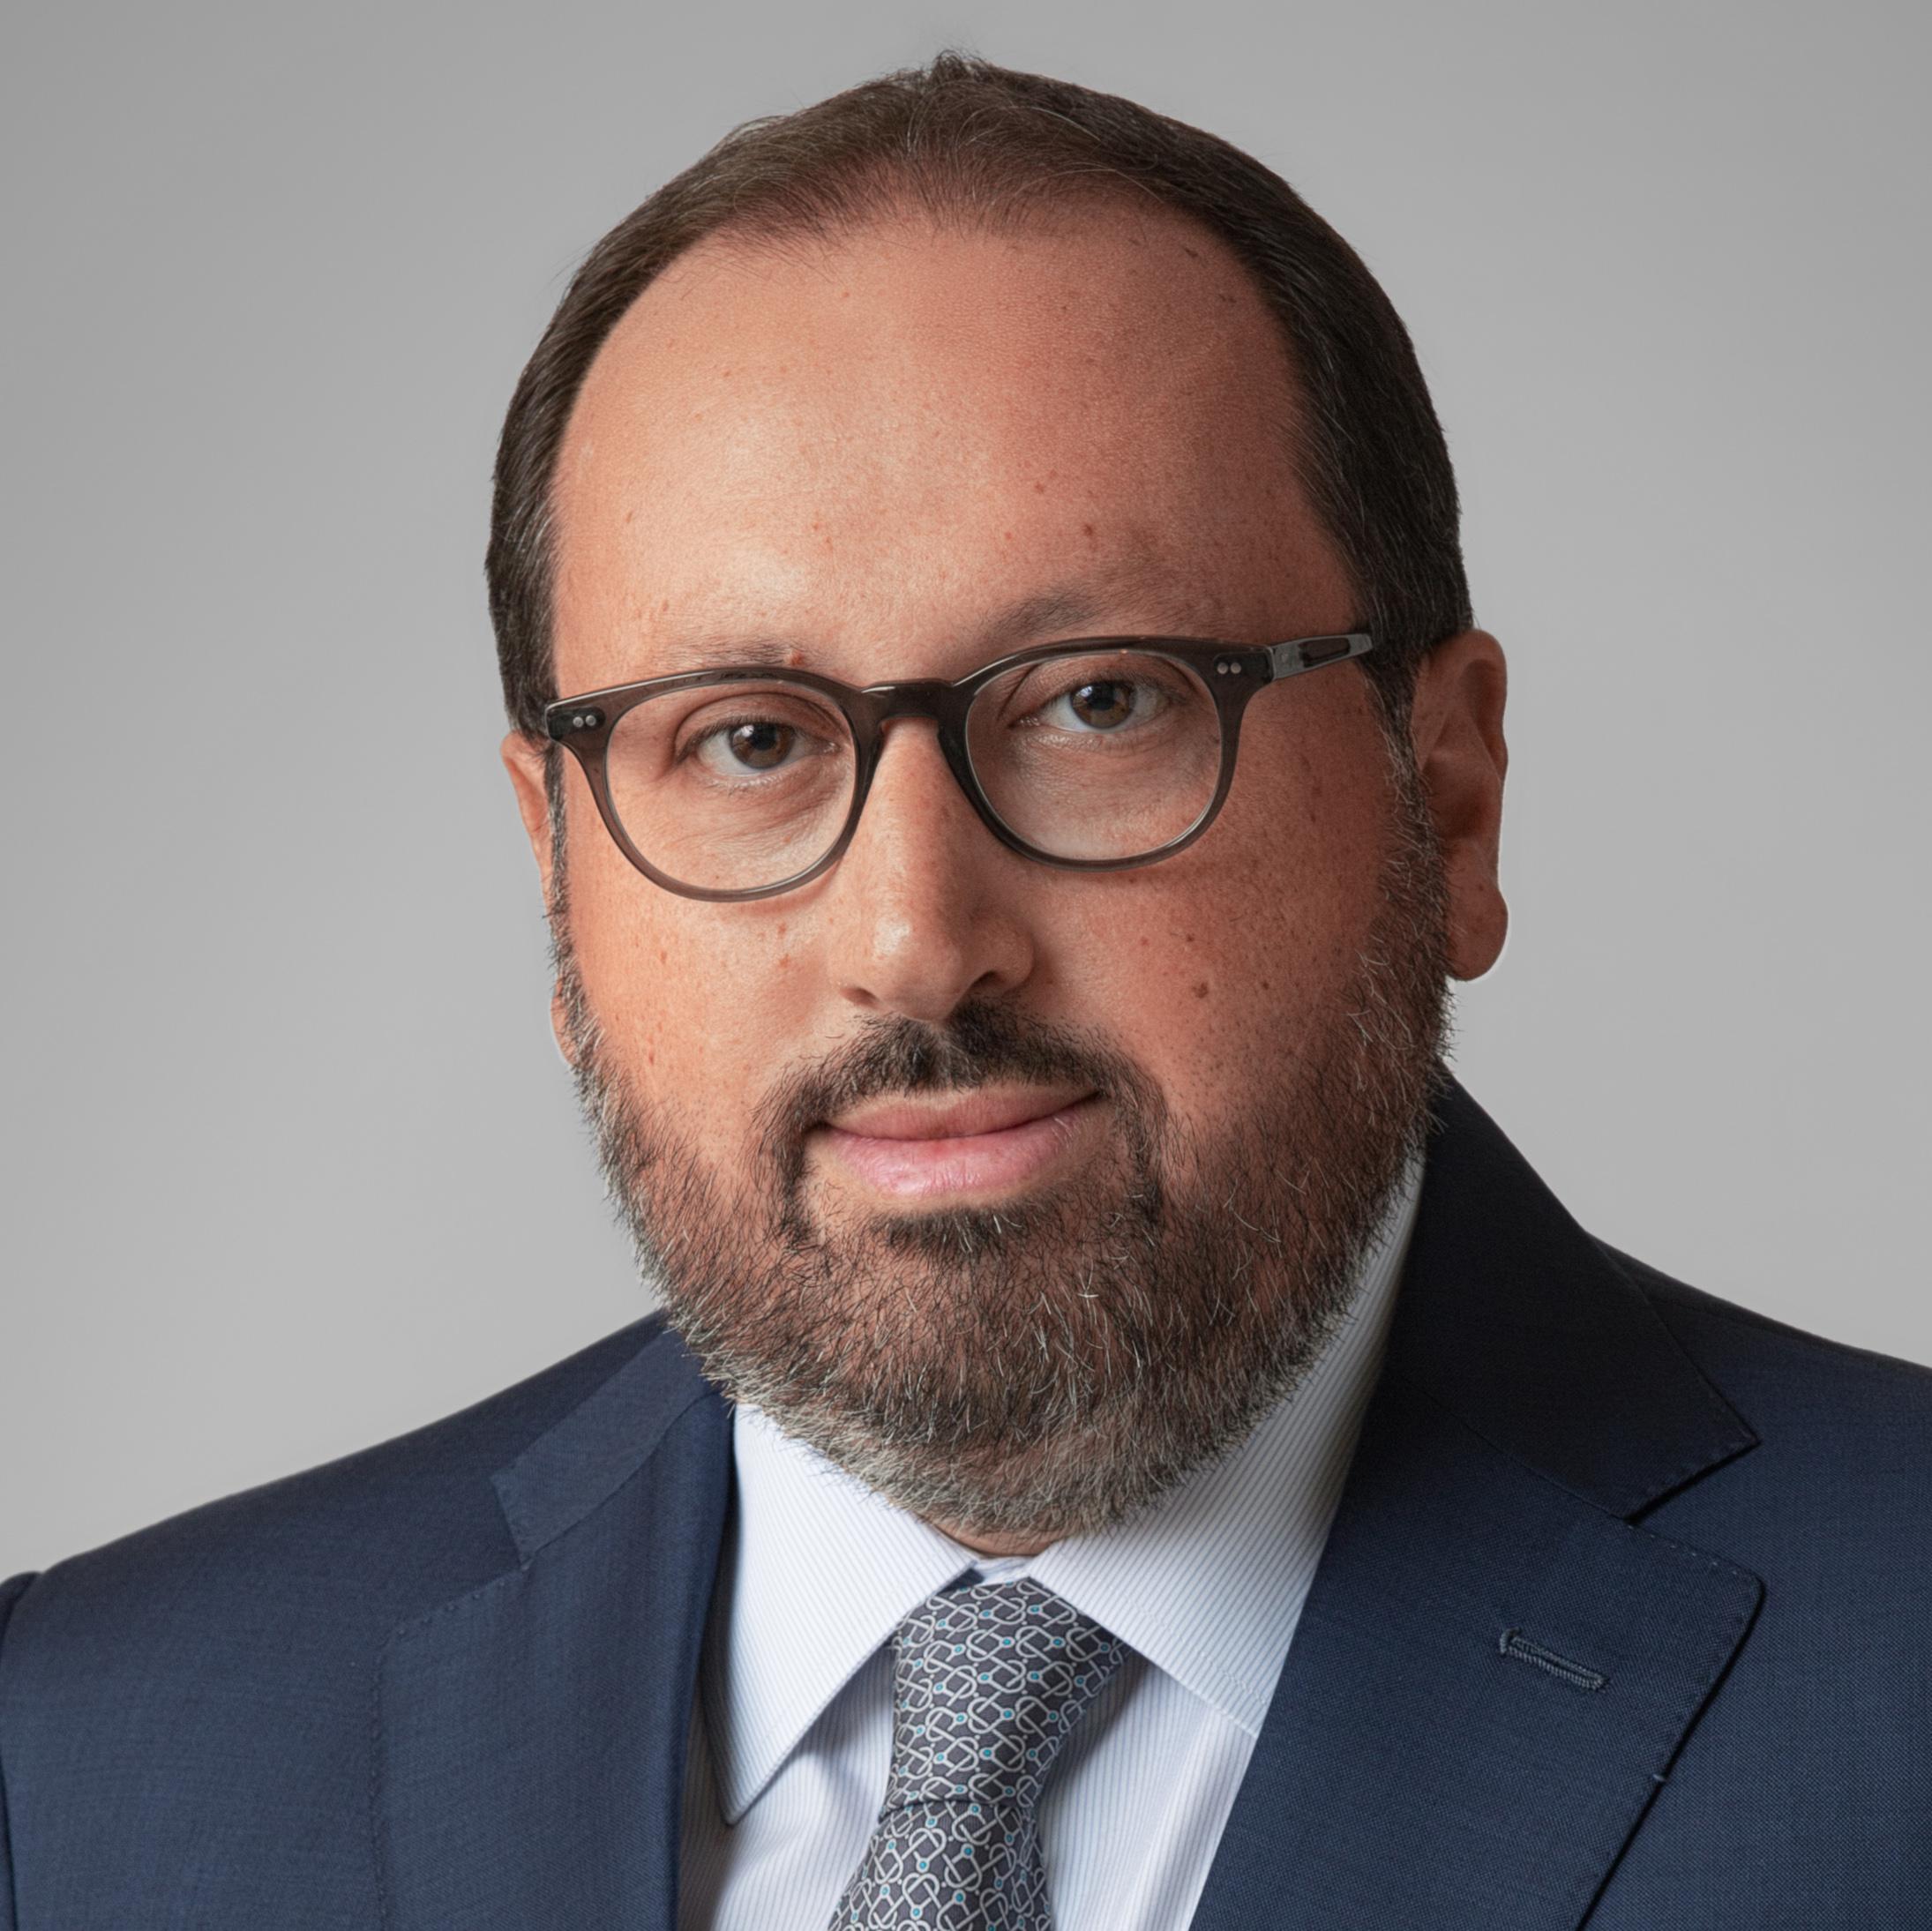 Majid Al Futtaim Records Sustained Financial Growth